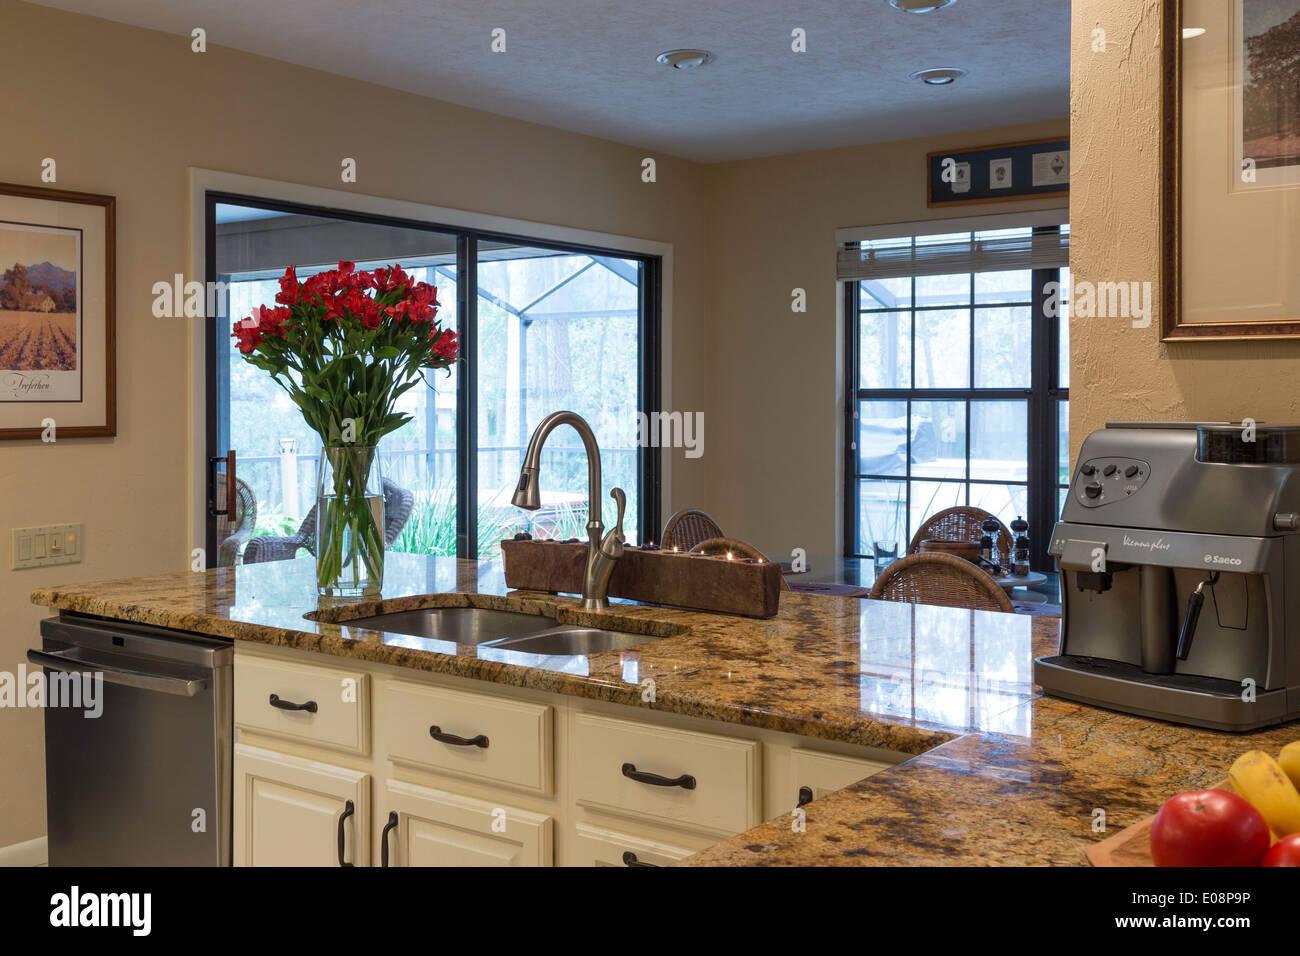 Showcase Modern Kitchen With Pass Through Raised Dining Bar, USA